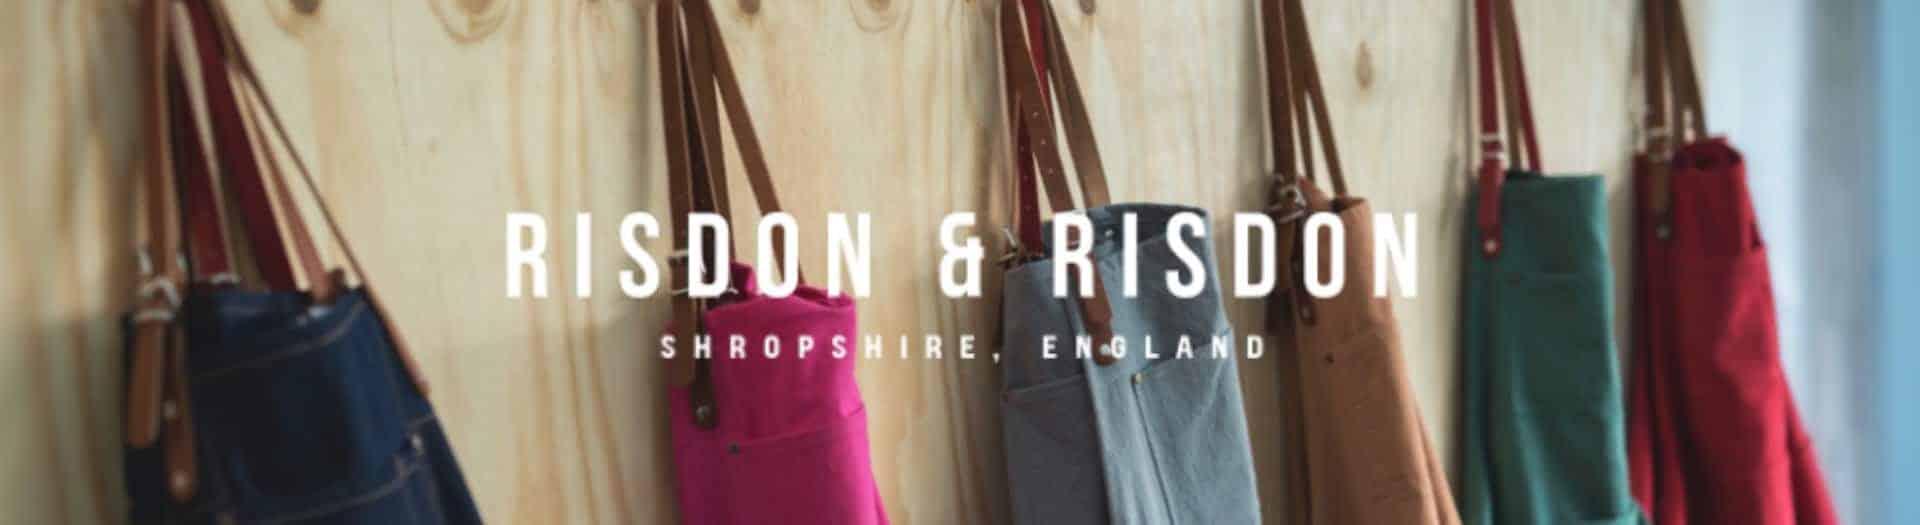 Risdon And Risdon Handmade Aprons Logo Header